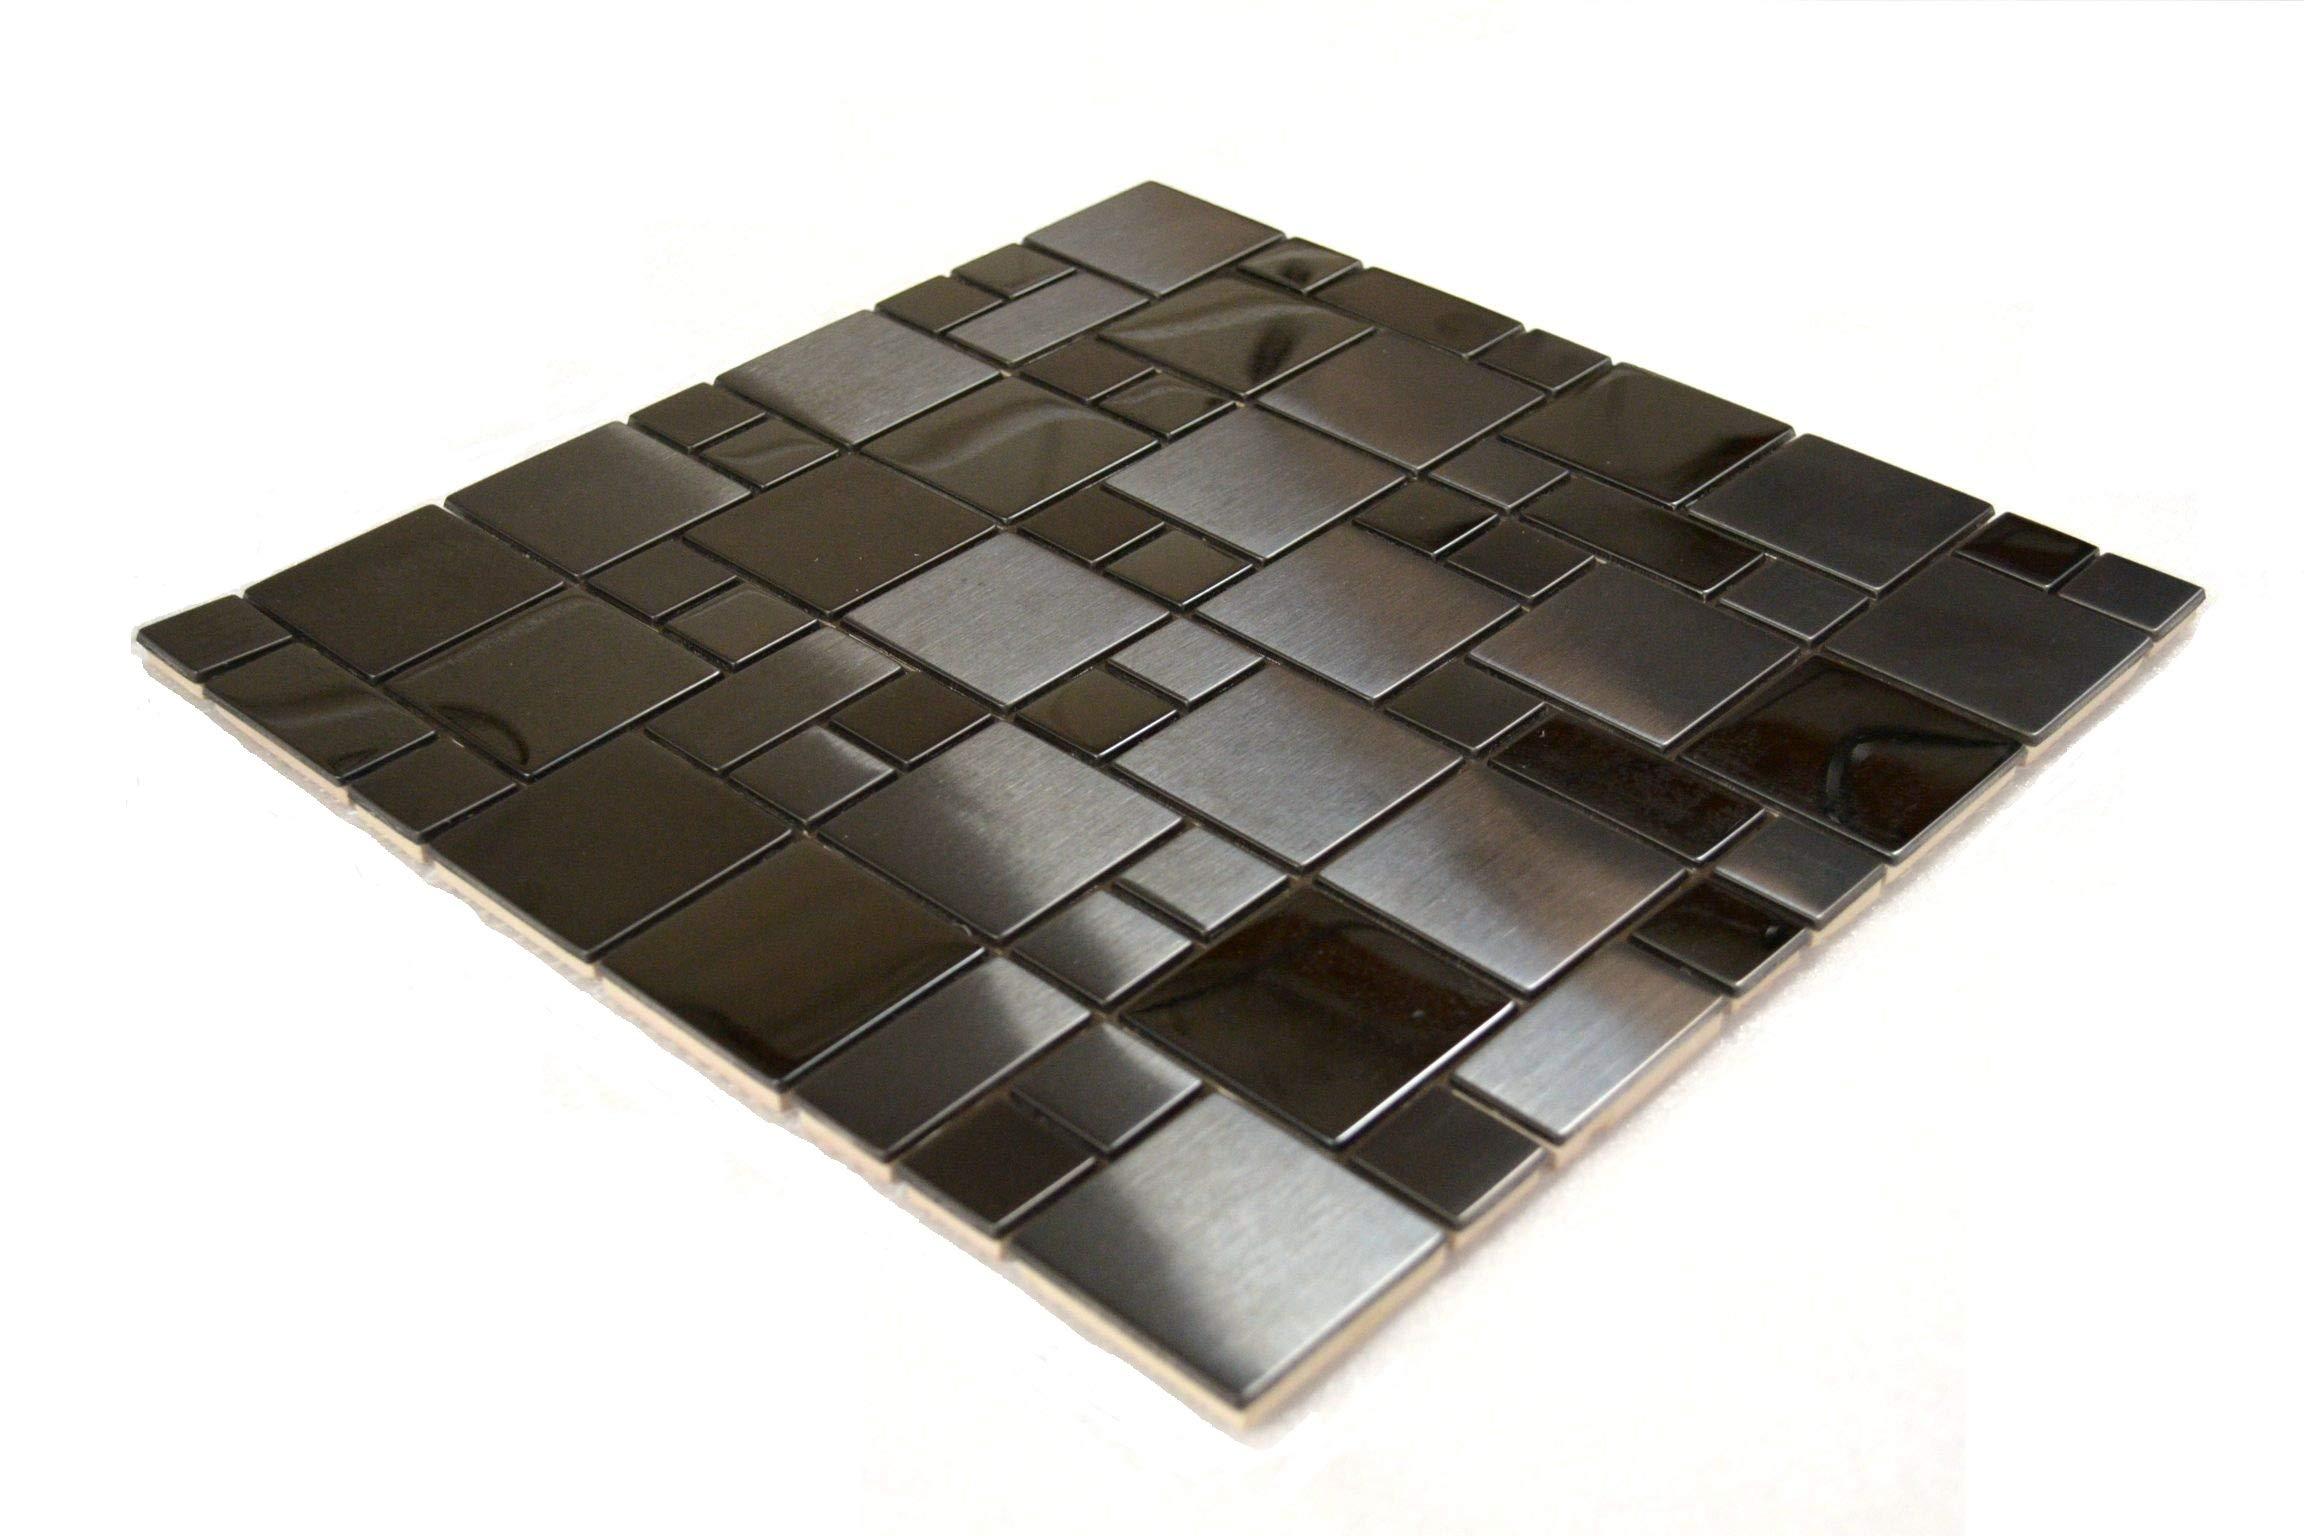 Black Stainless Steel Metal French Pattern Mosaic Tile for Kitchen Backsplash (10 Sheets)